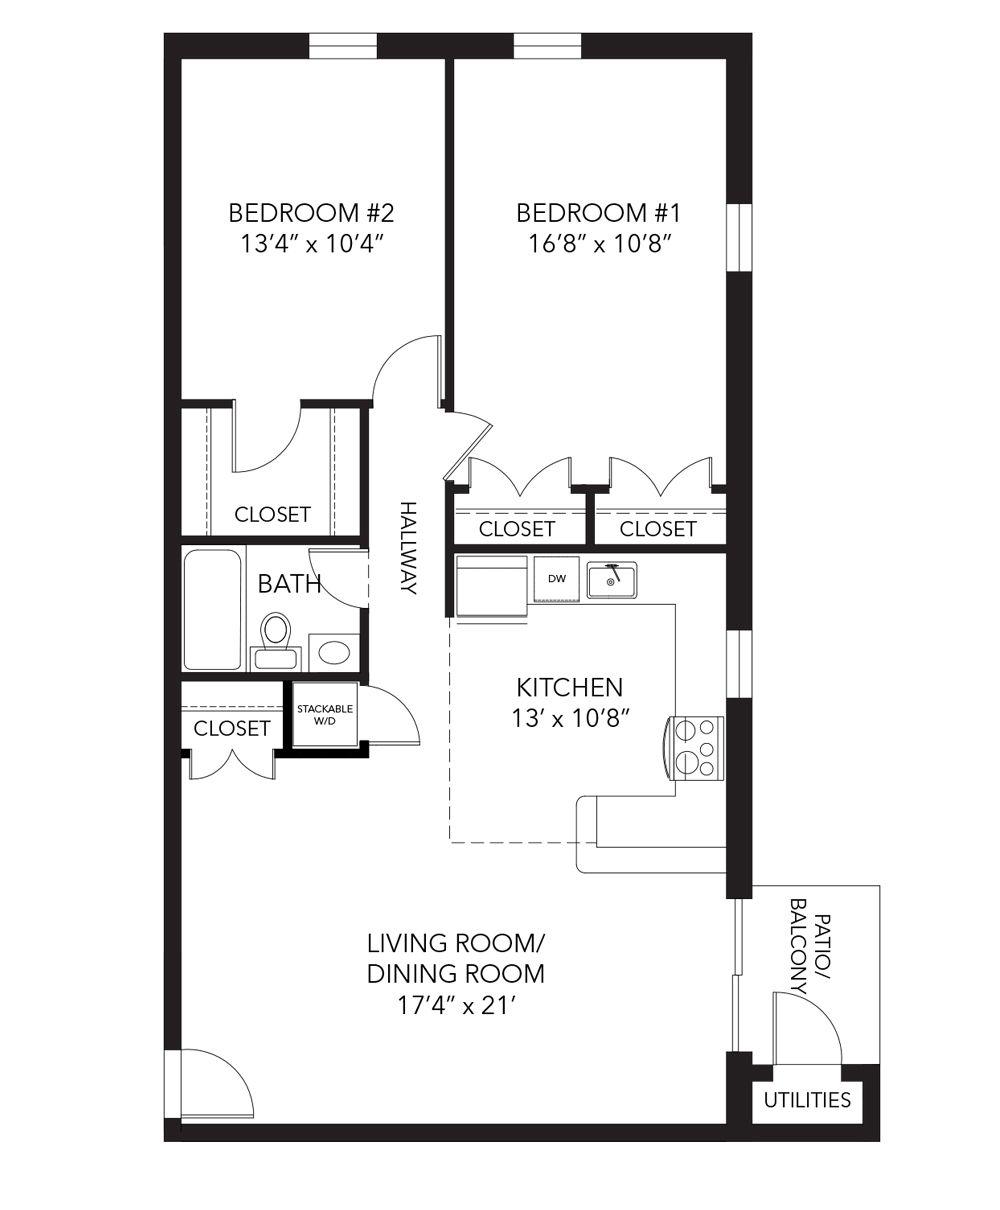 marshall floor plan - 2 bed, 1 bath, 890 sq ft | corner park